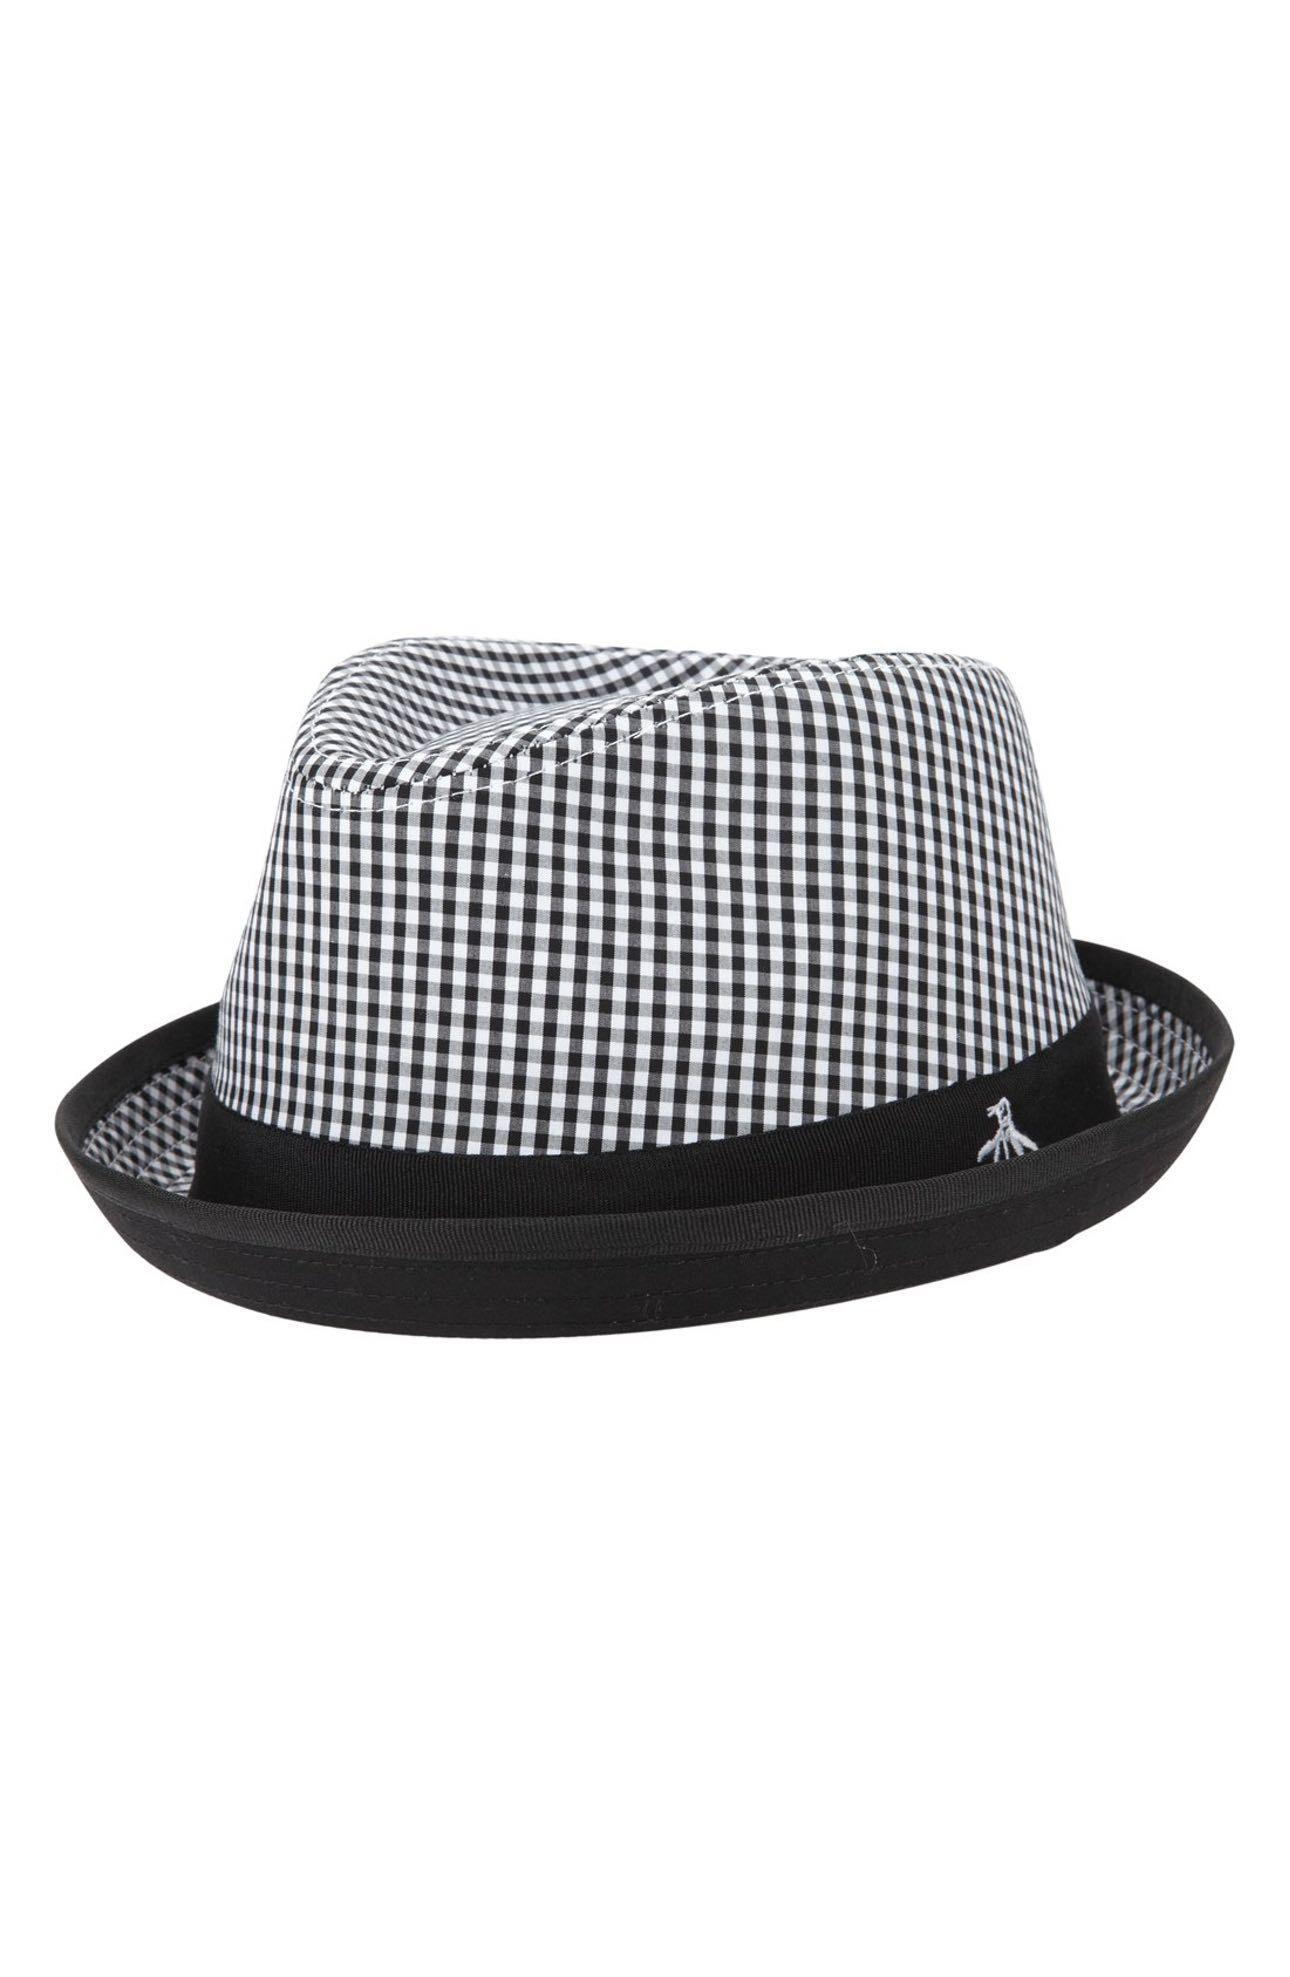 d6d01eb4a5799 Product Image 1 Stylish Hats